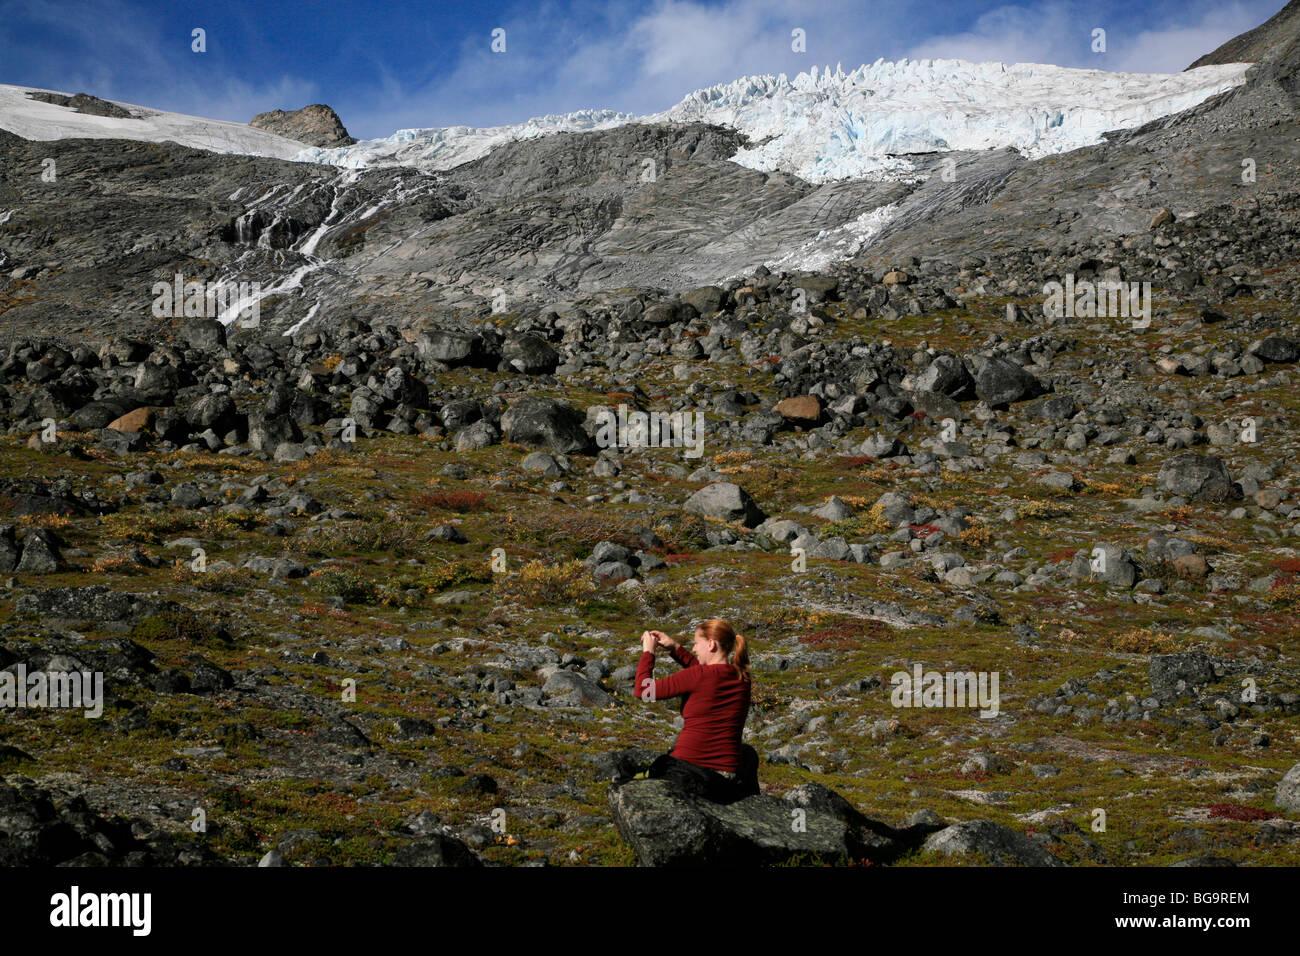 Galdh¿piggen Styggebreen Glacier from the Visdalen ascent in the Jotunheimen National Park, Oppland, Norway, - Stock Image